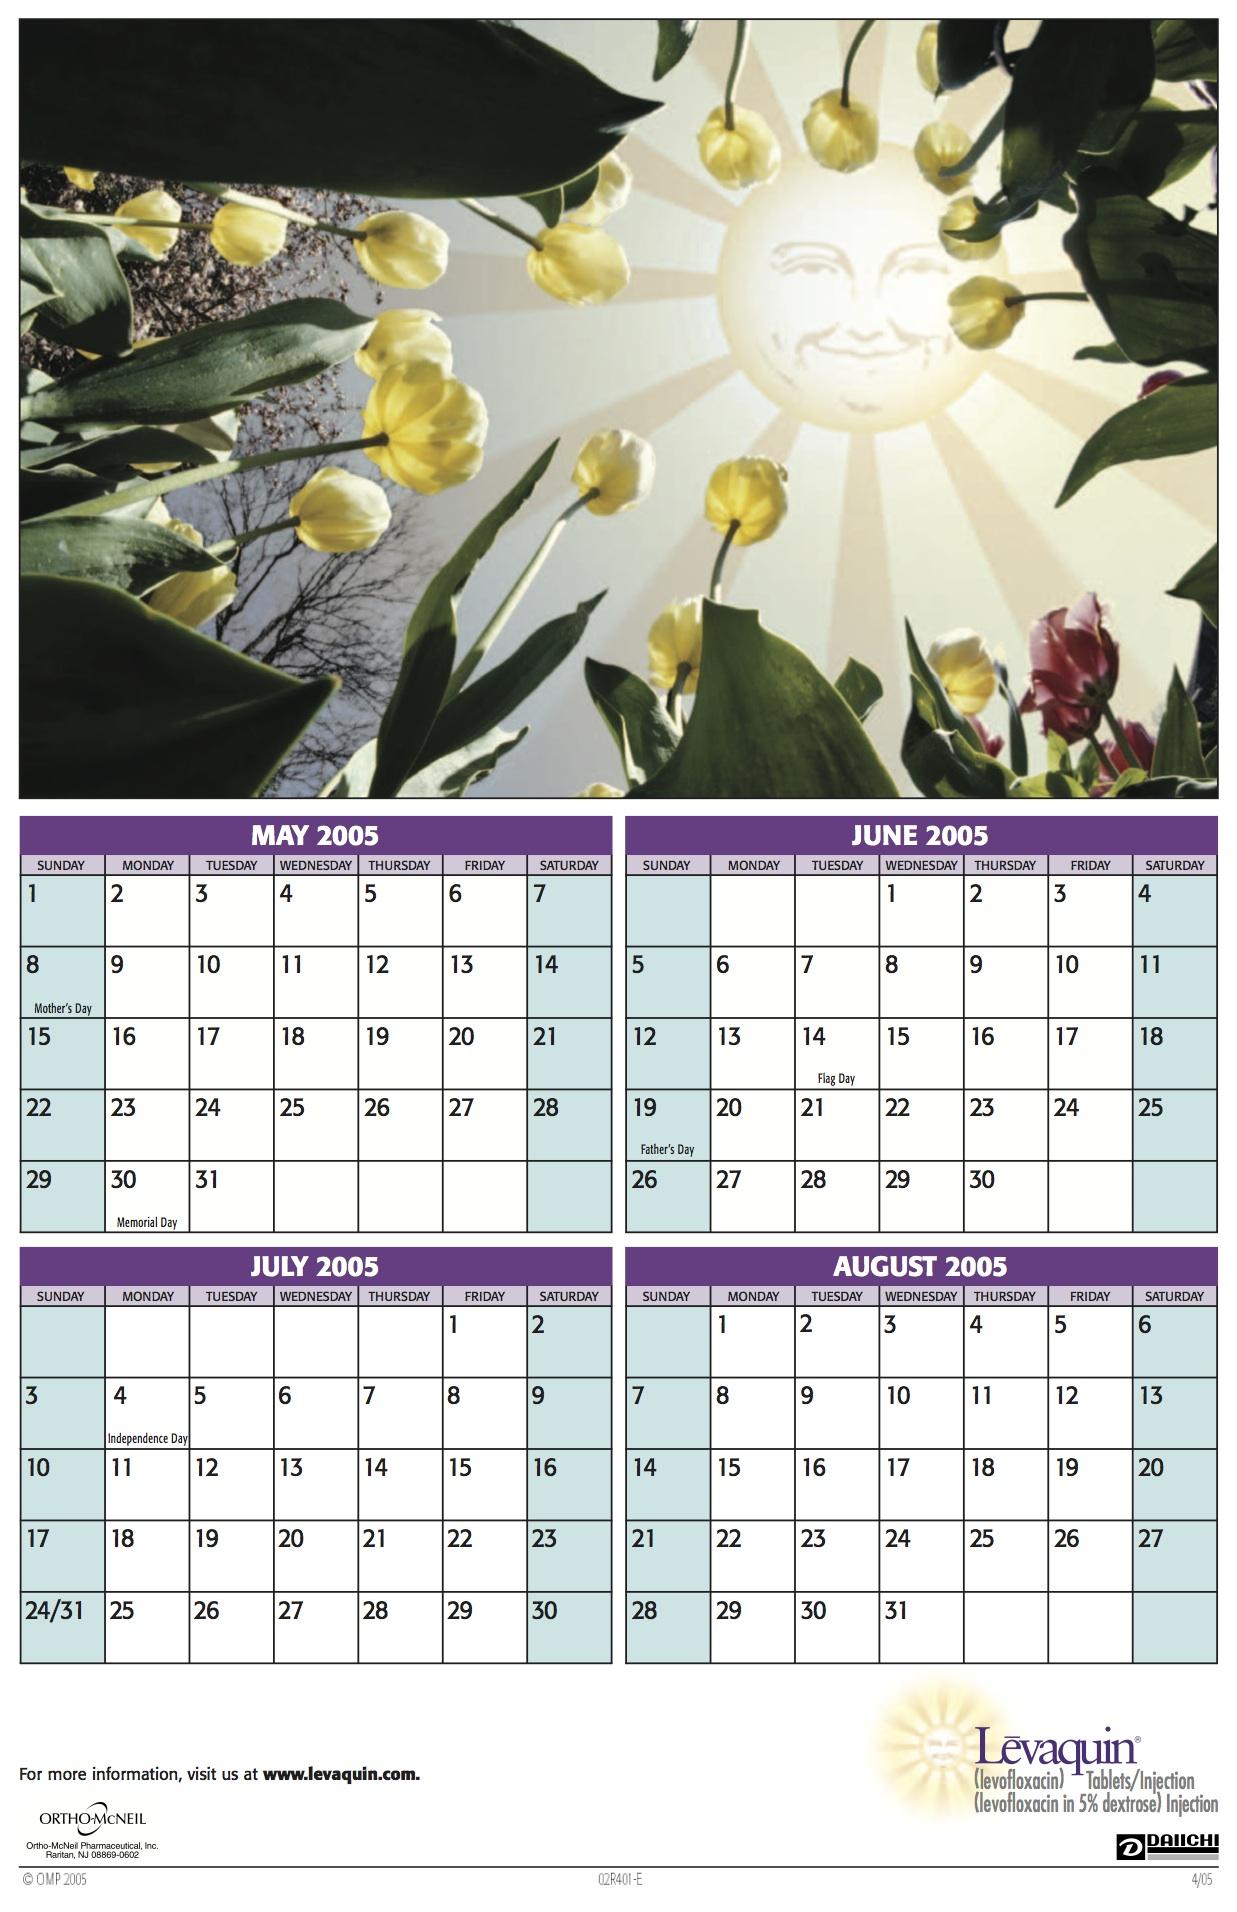 Levaquin-Calendar-.jpg